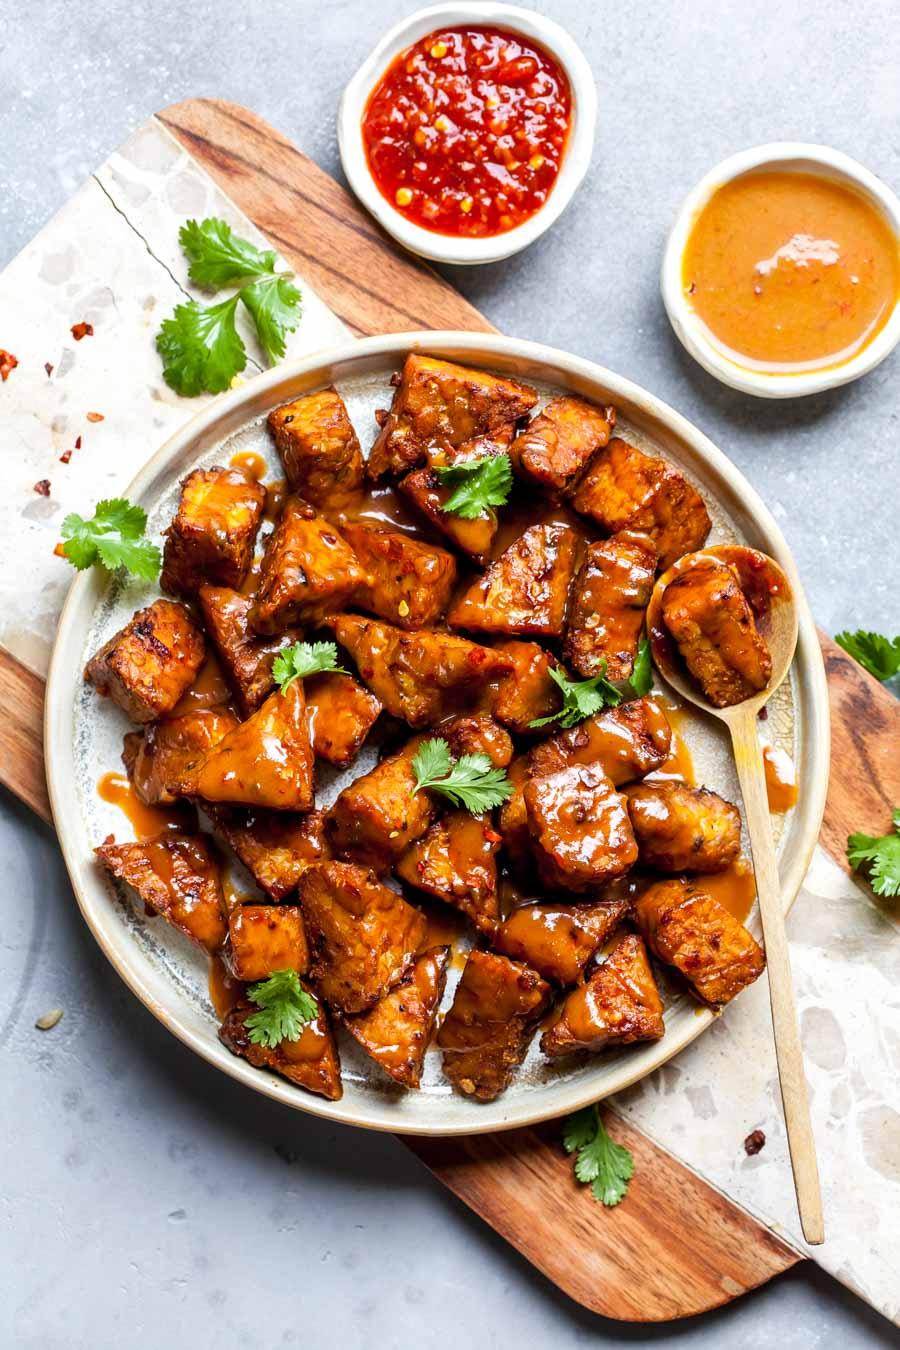 Peanut-ginger glazed tempeh for meatless entree